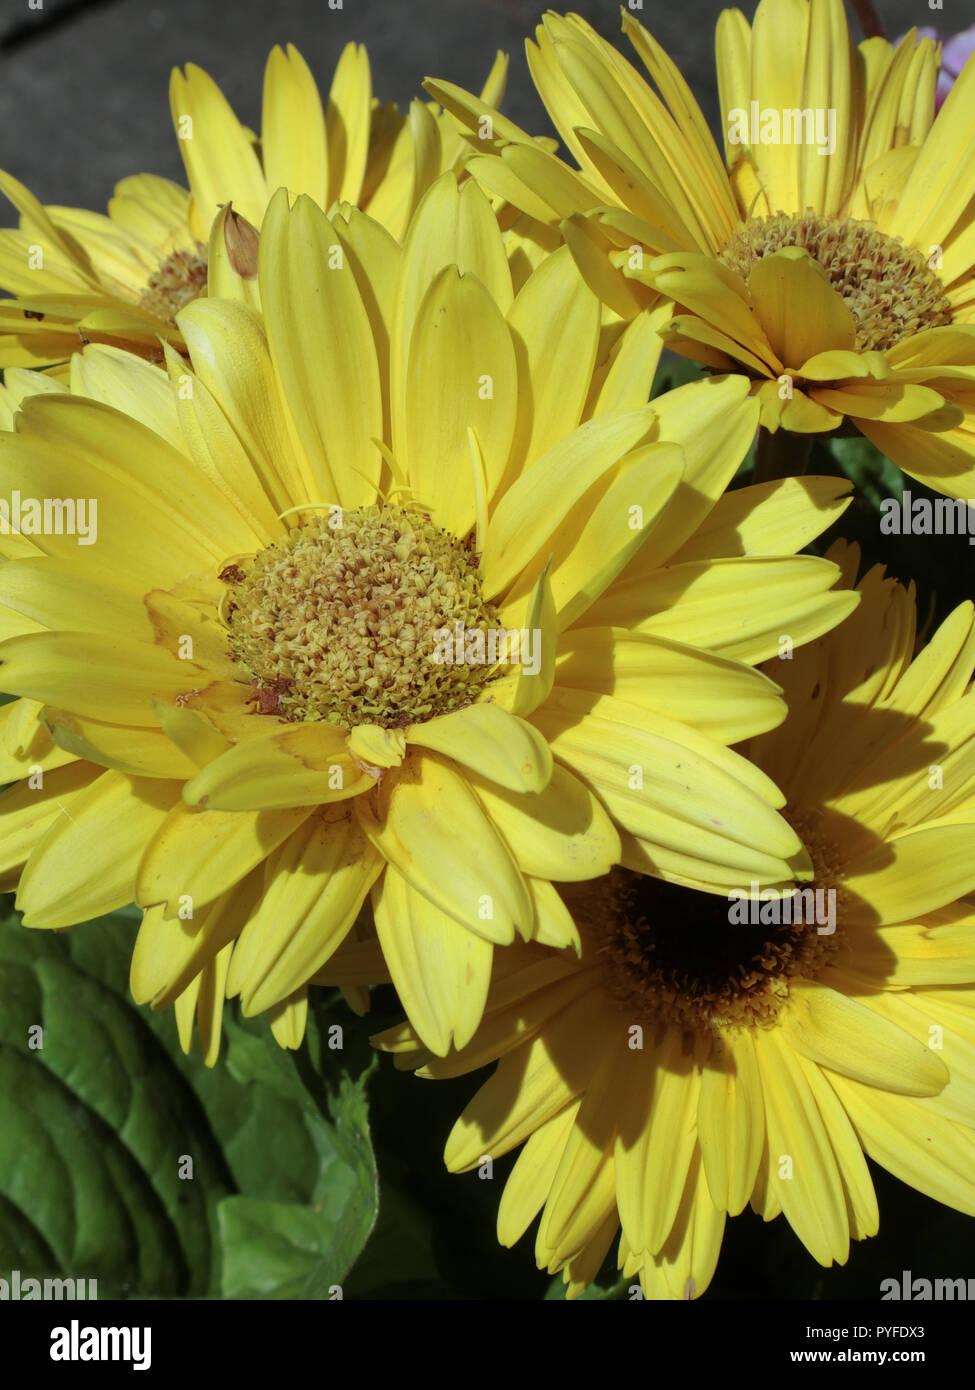 Gerbera Mega Revolution Yellow Flowering Variety in Summer - Stock Image